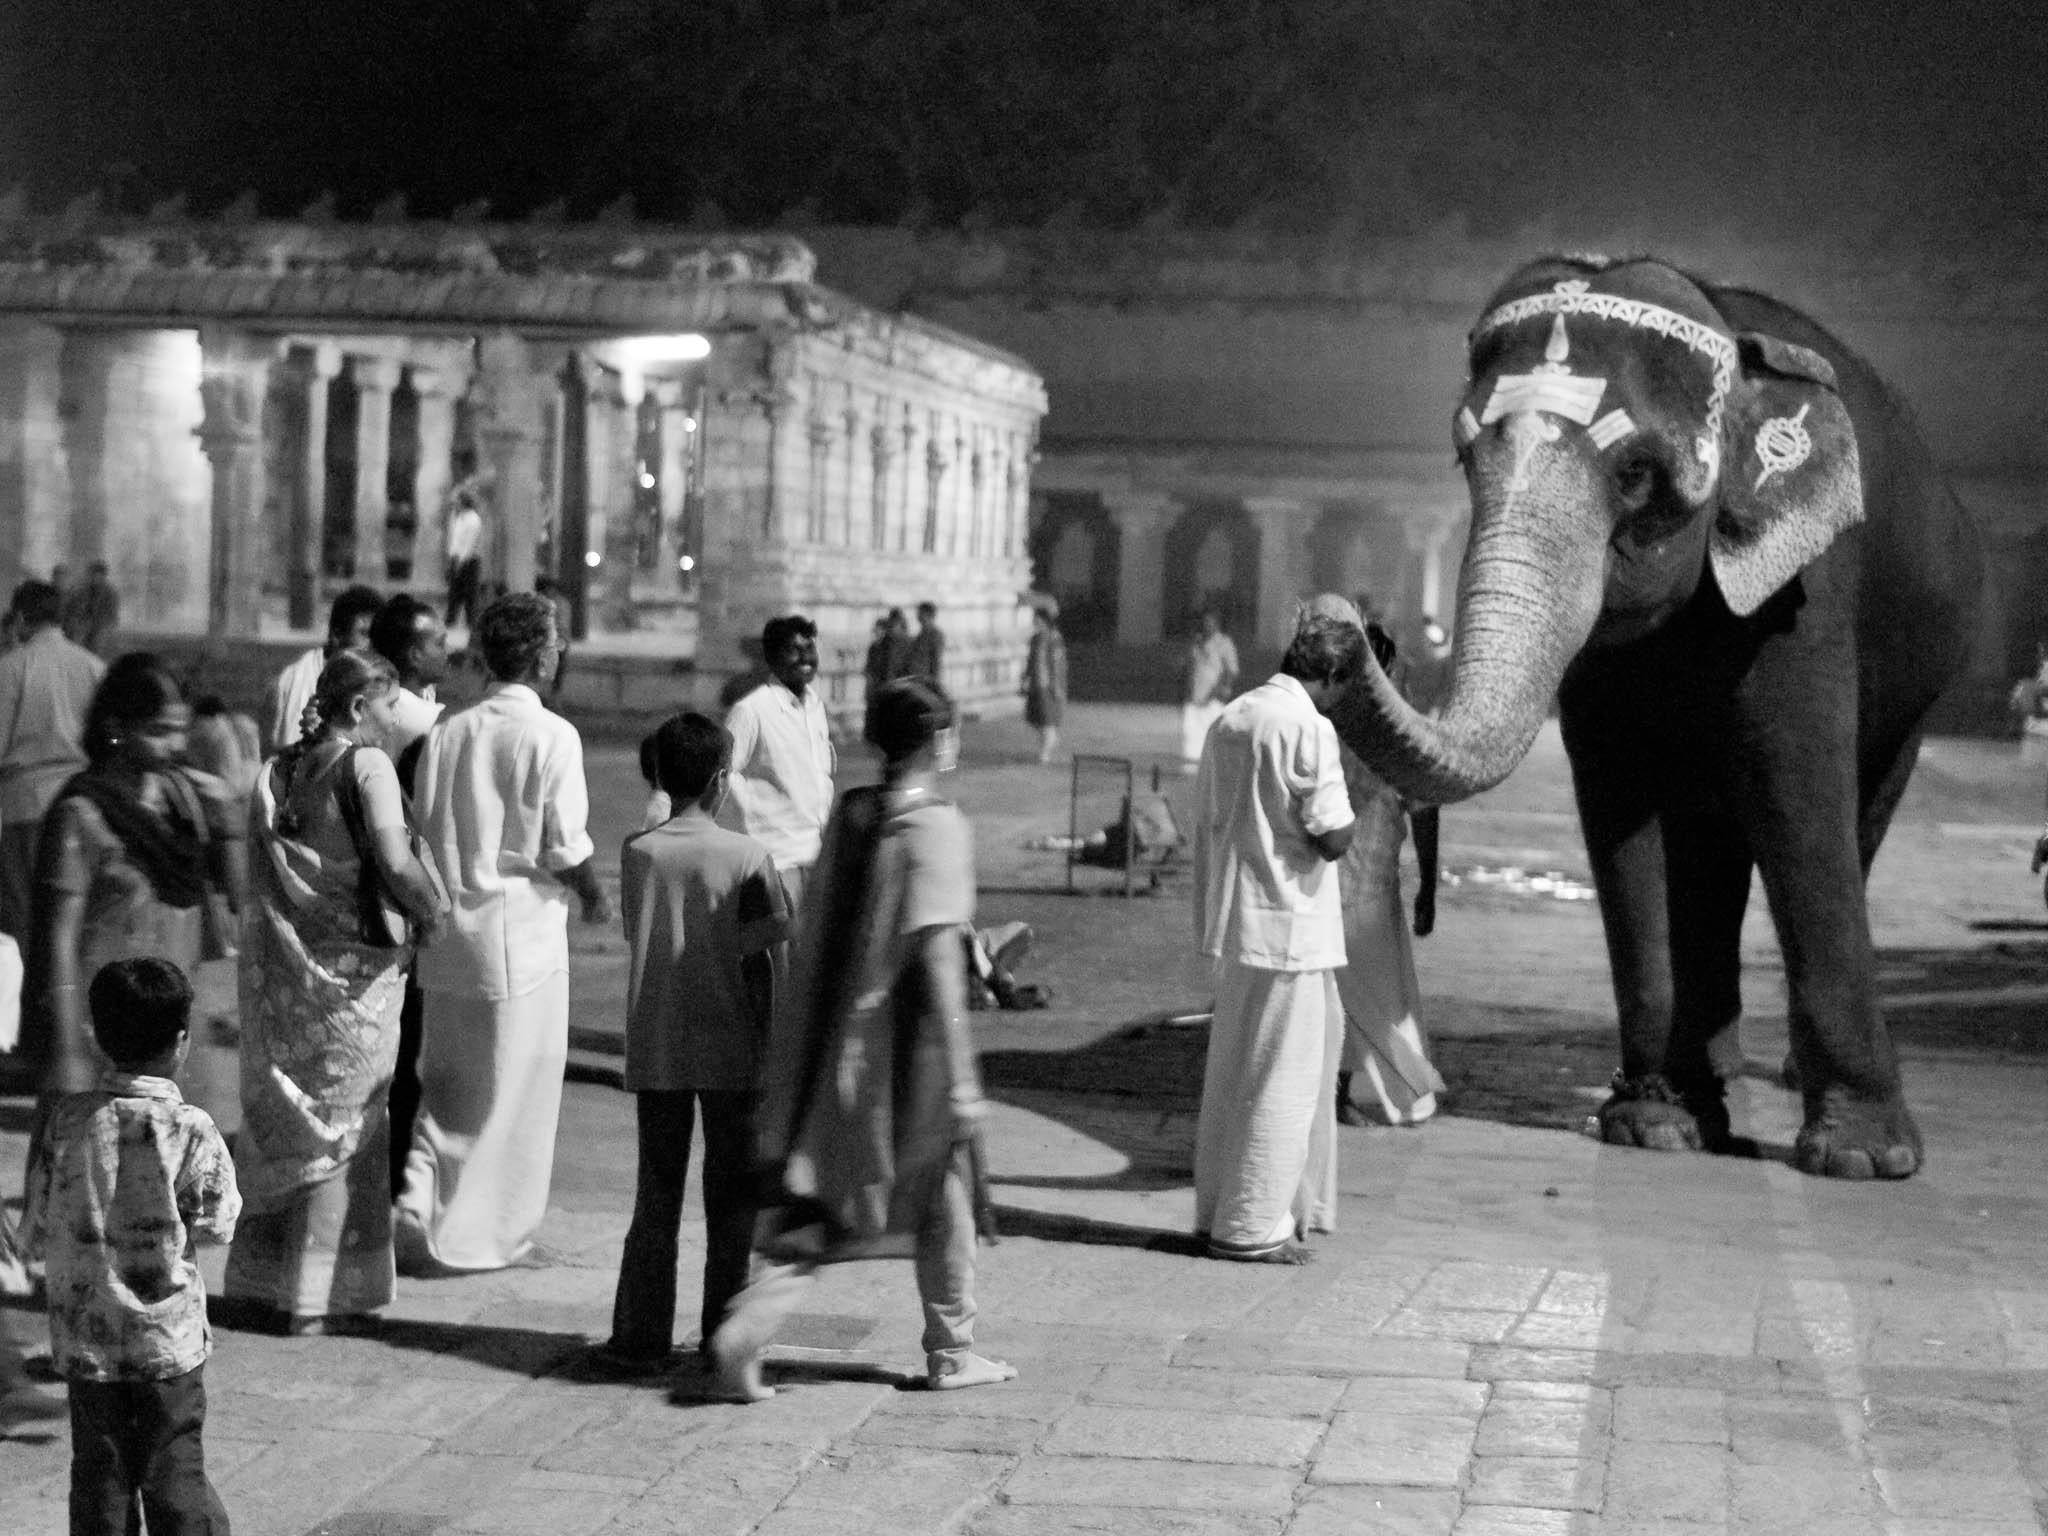 A temple elephant blessing the devotees on a full moon night at Brihadishvara Temple, Thanjavur, Tamil Nadu, India